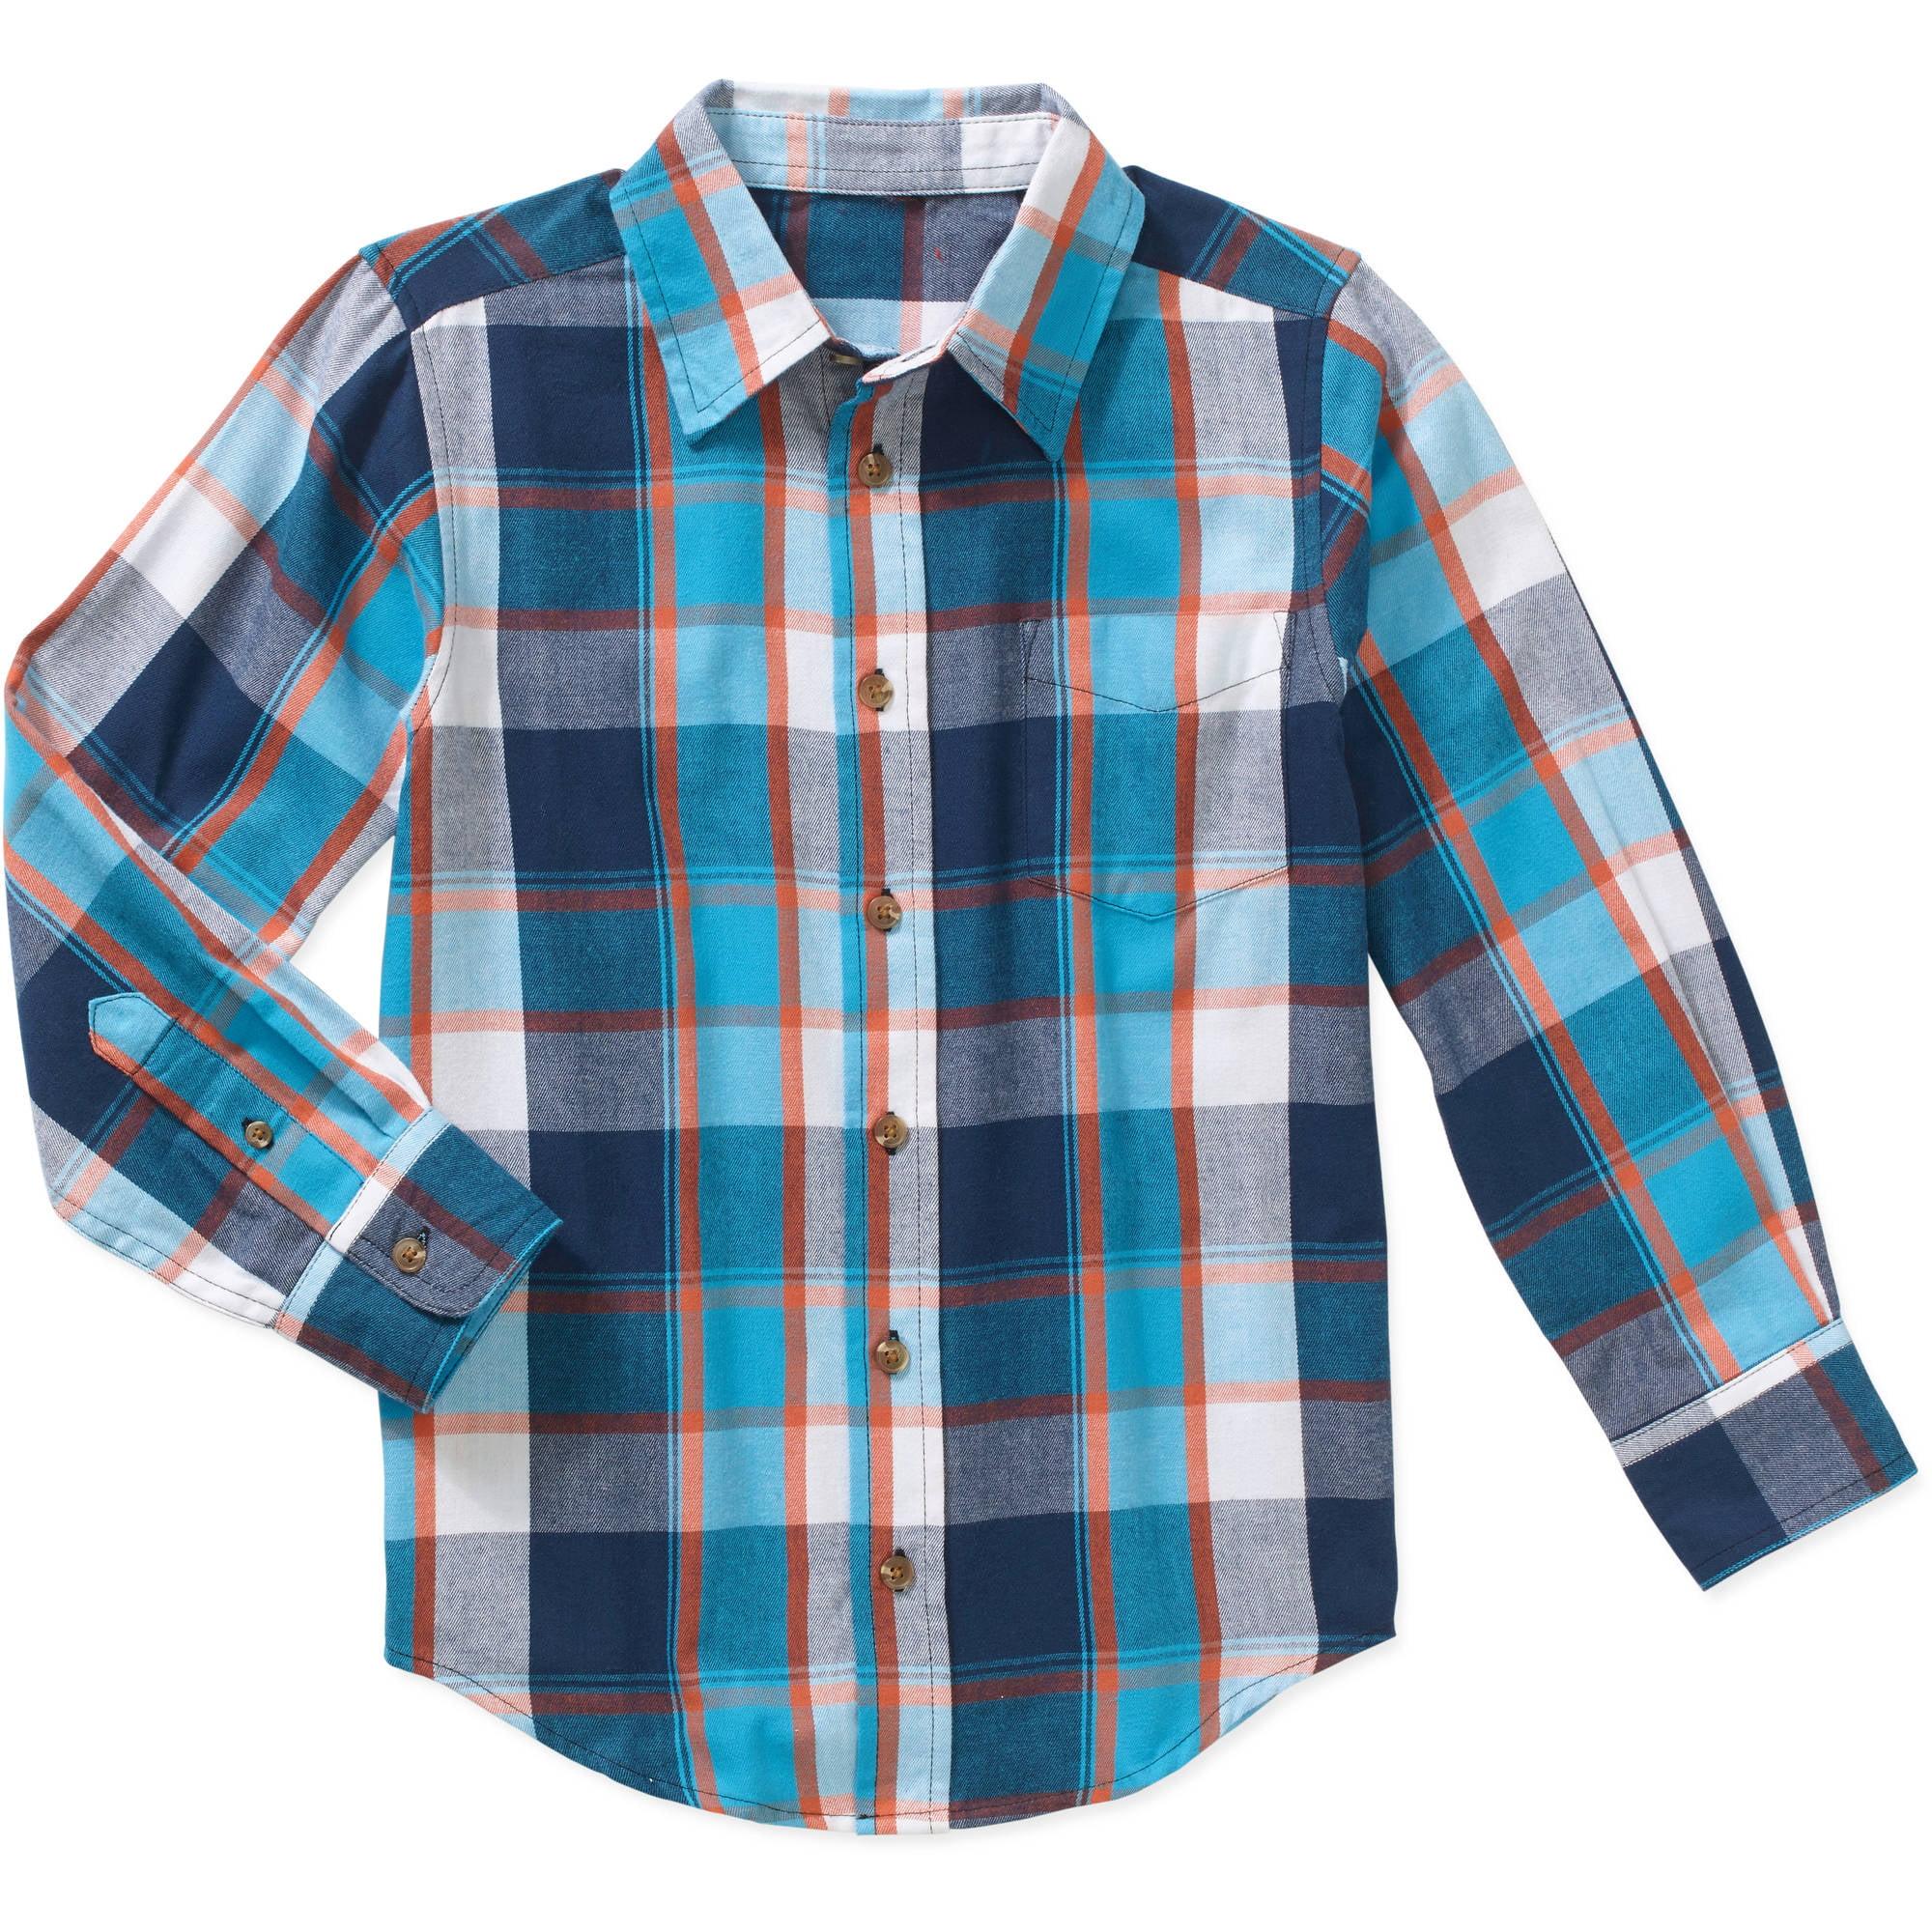 Wrangler Boys' Long Sleeve Plaid Twill Woven Shirt